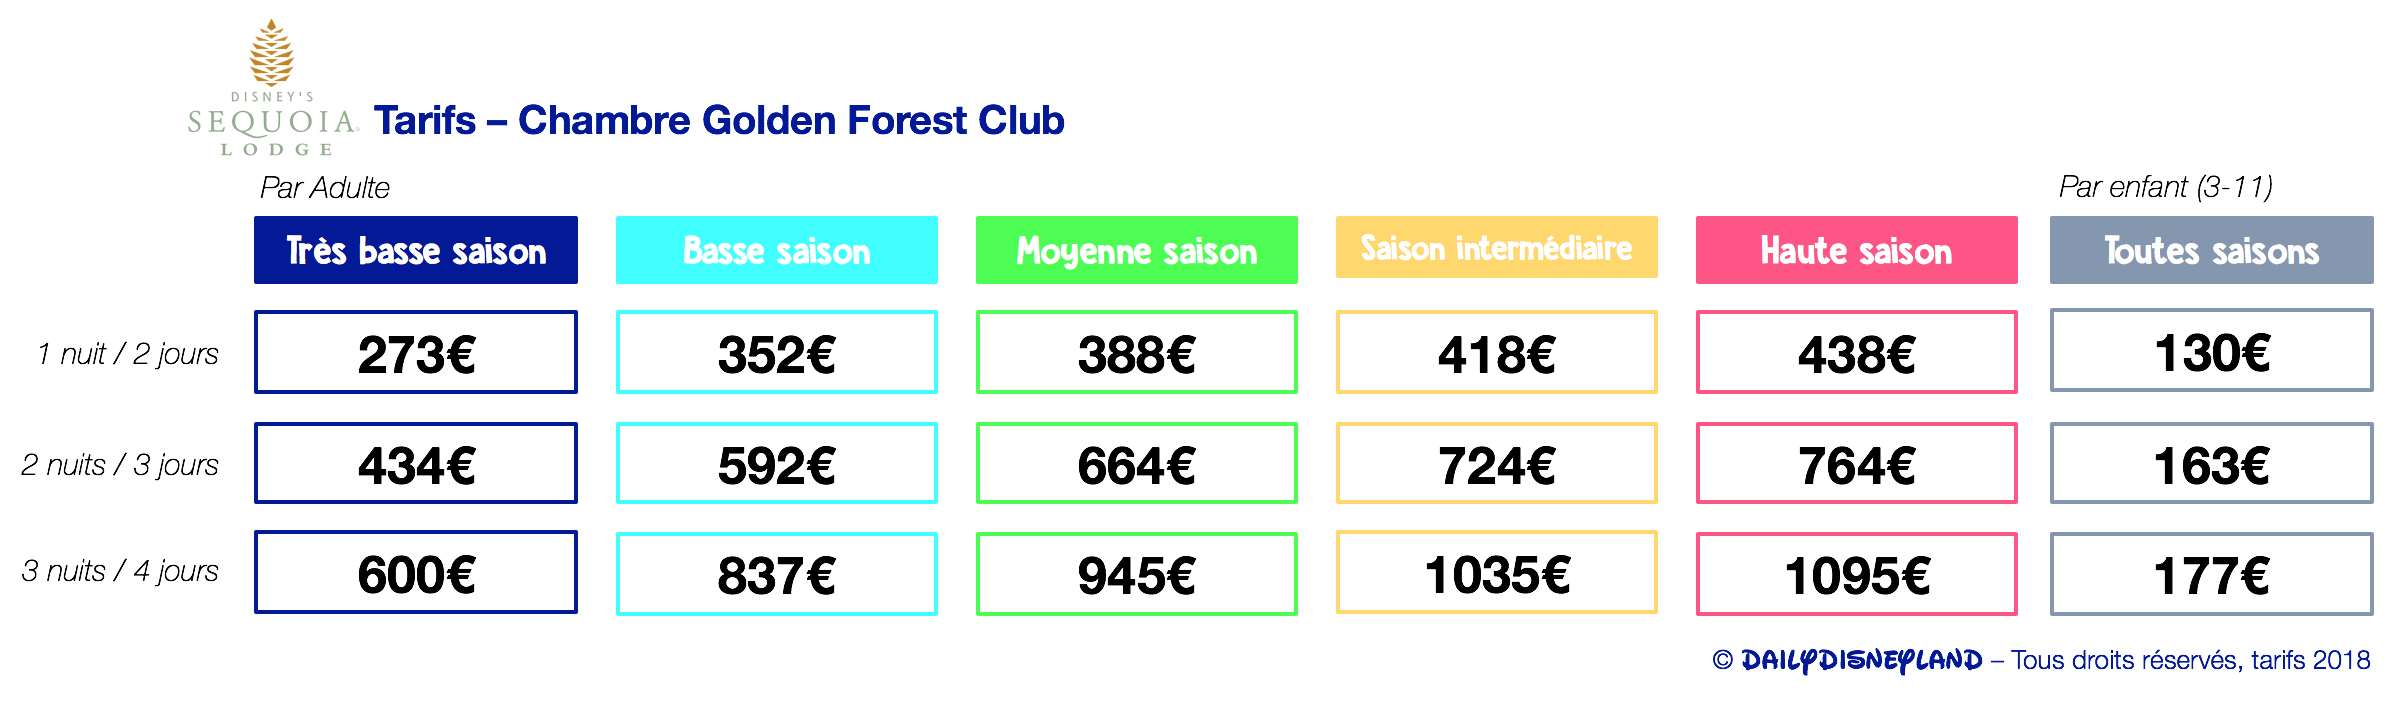 Tarifs Disney's Sequoia Lodge, chambre Golden Forest Club disneyland paris pas cher